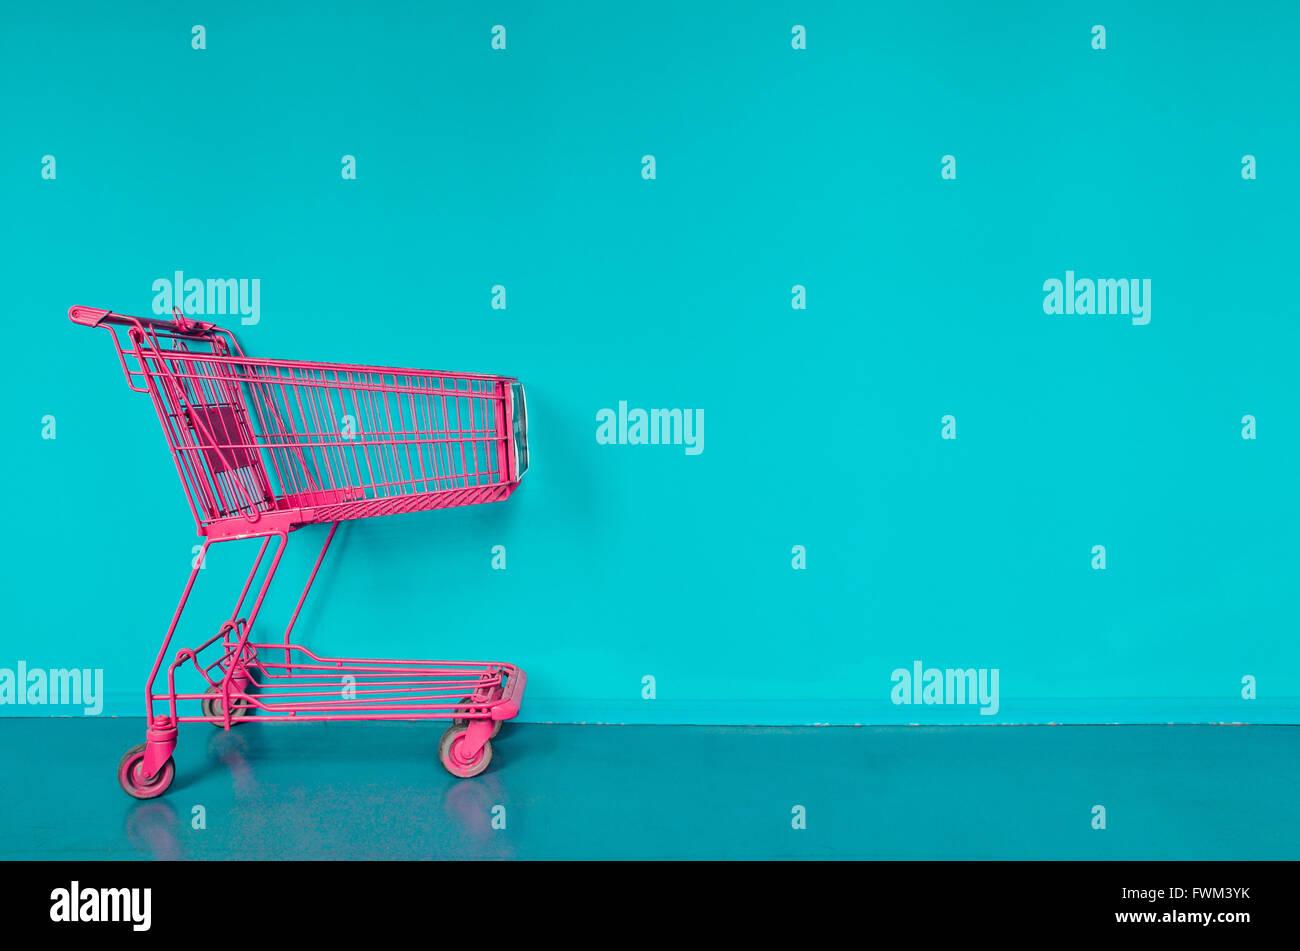 Pink Compras Contra la pared turquesa Imagen De Stock